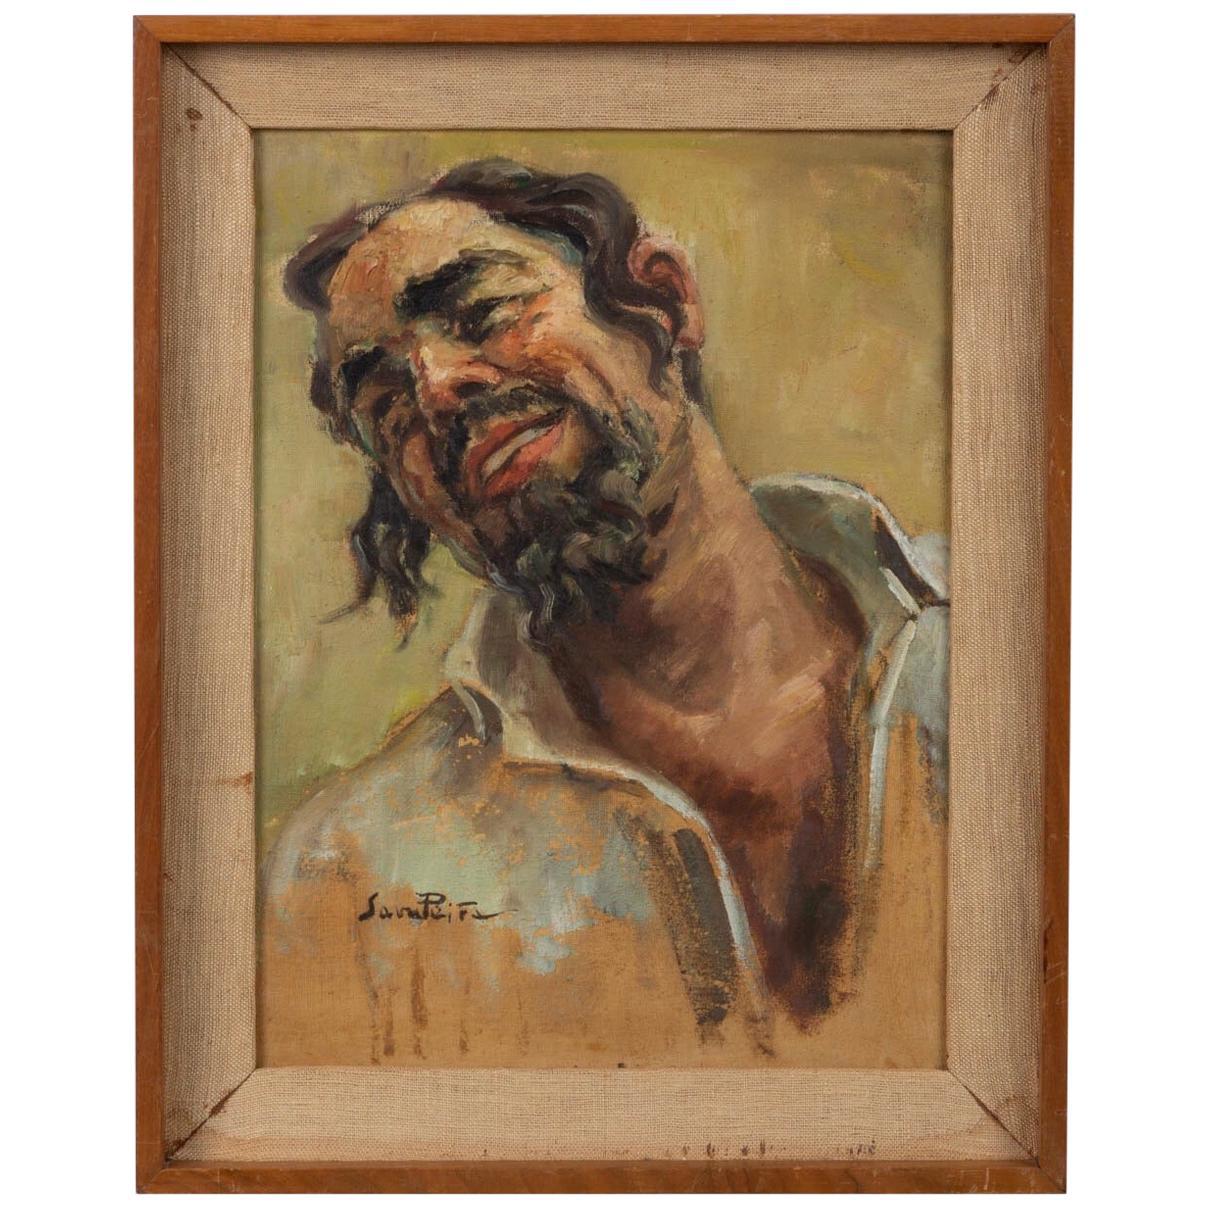 Portrait of a Man by Sara Peita